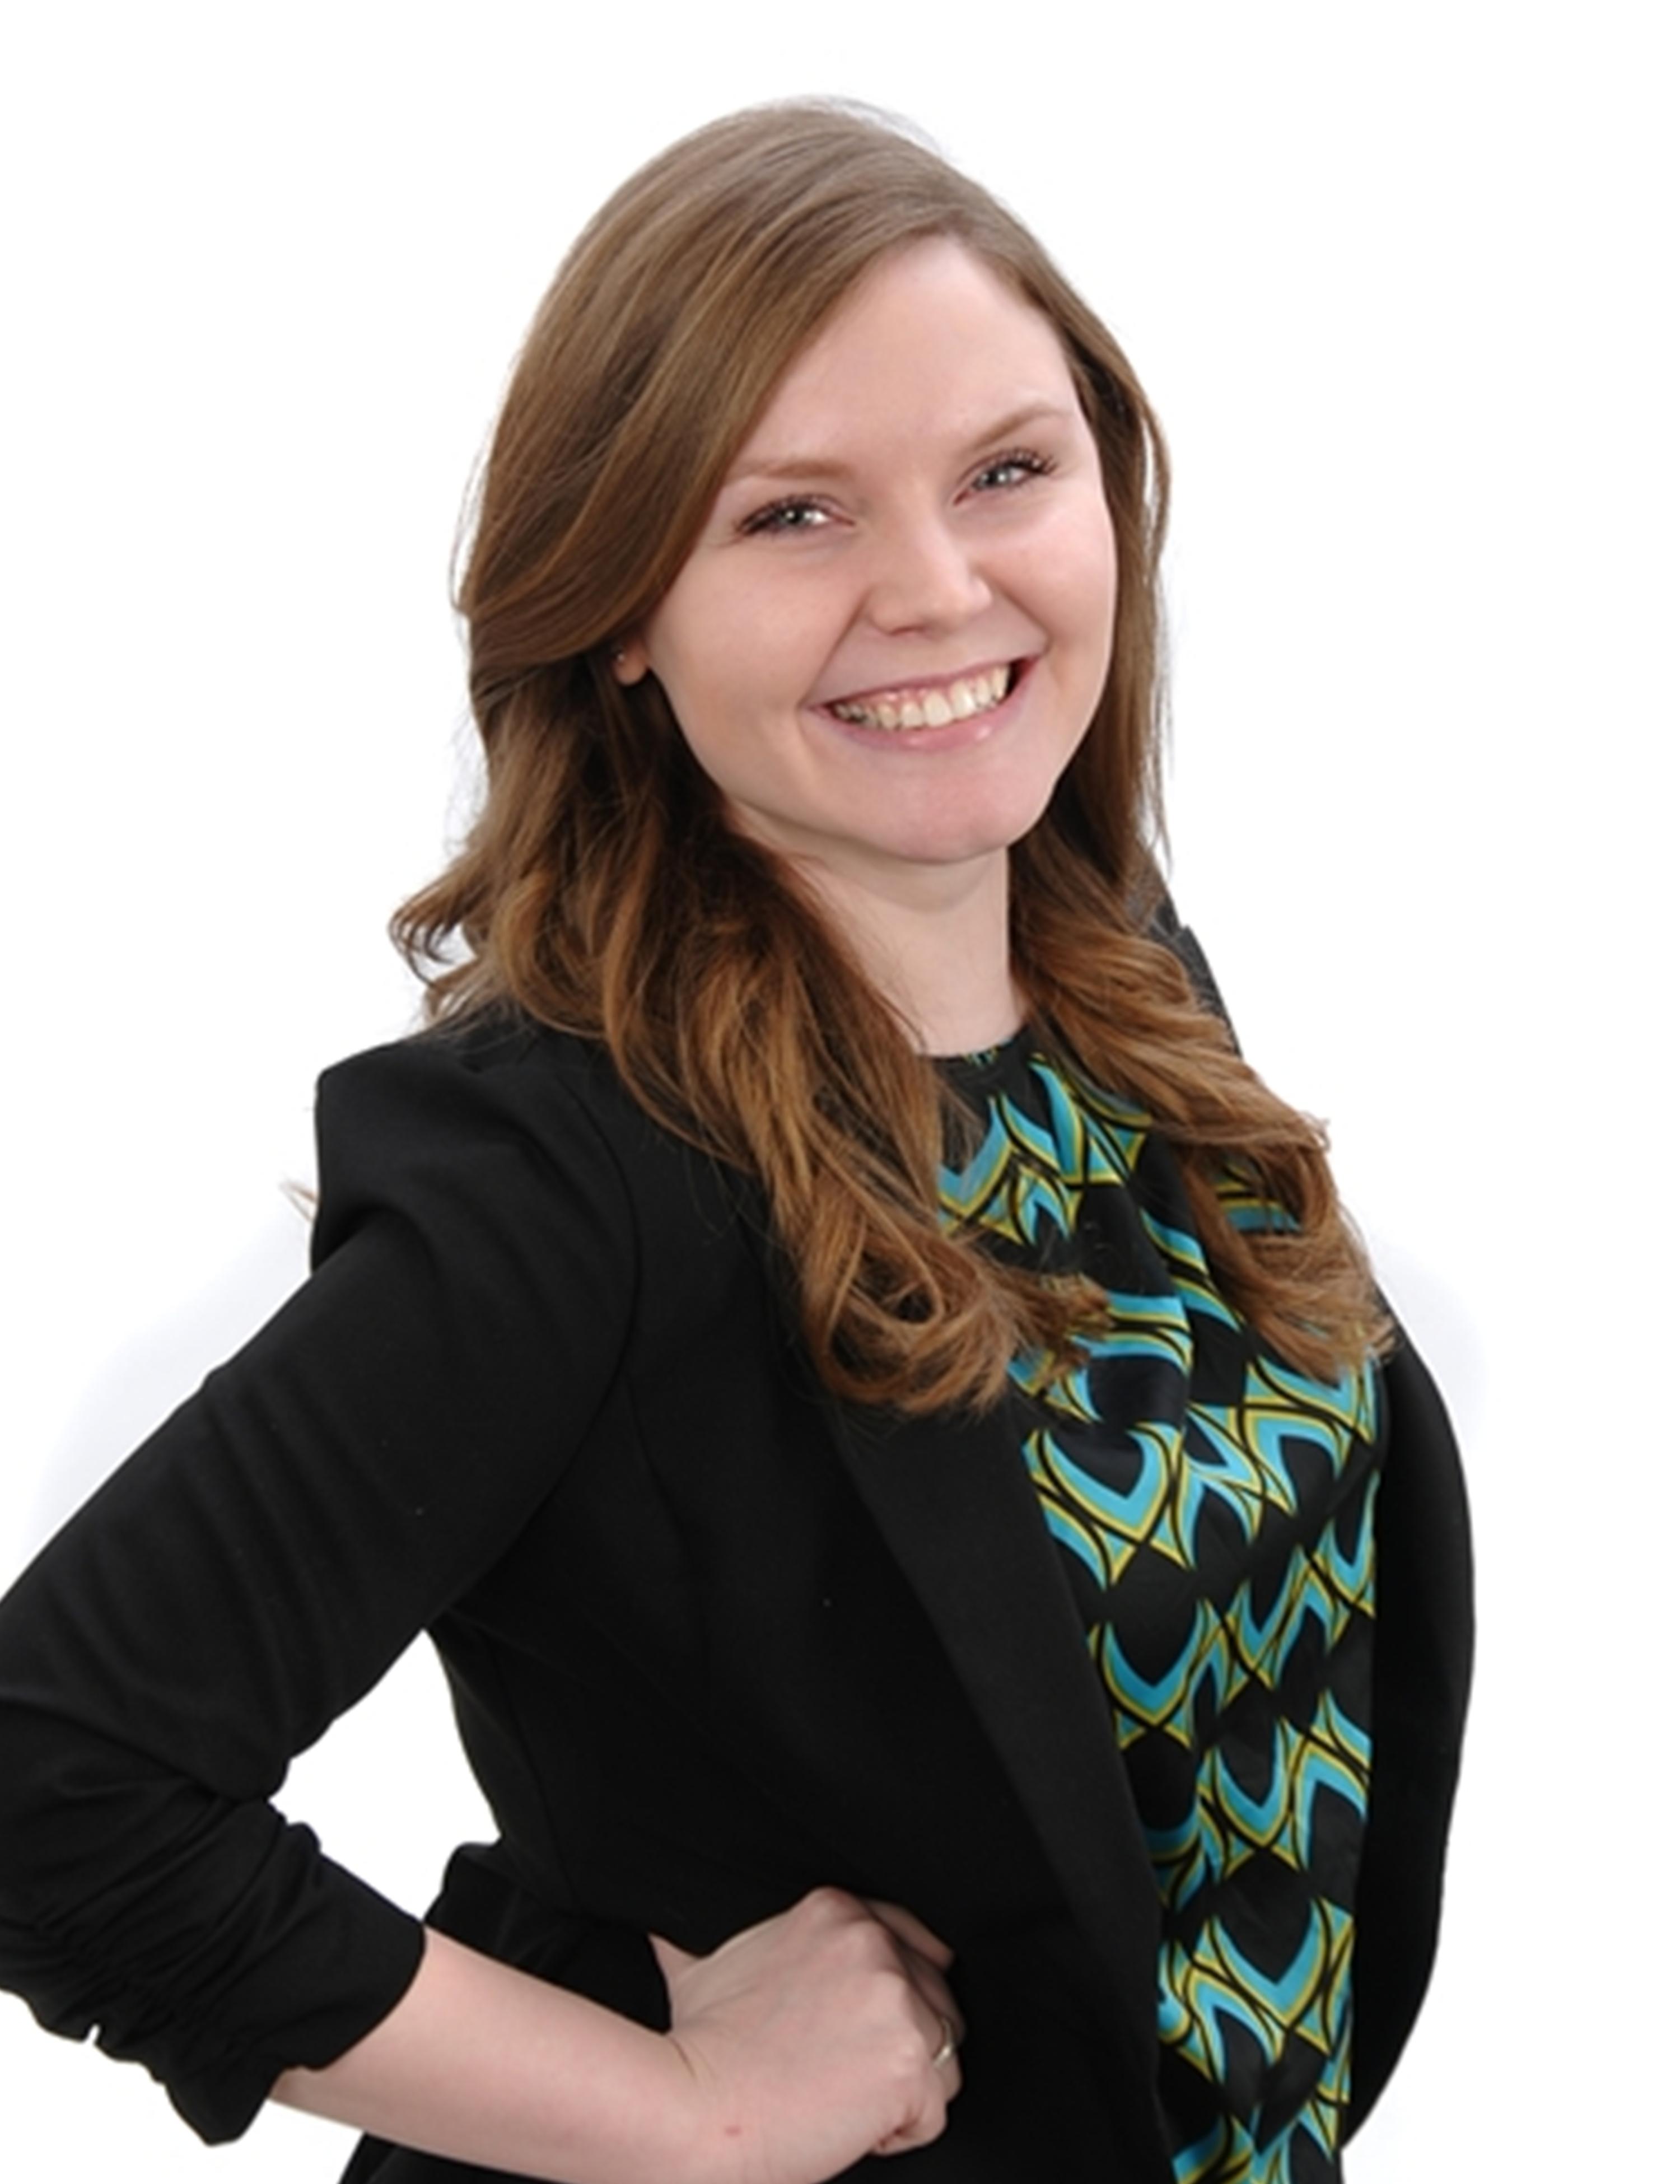 Amanda Mattingly | Advertising and Creative Design Specialist